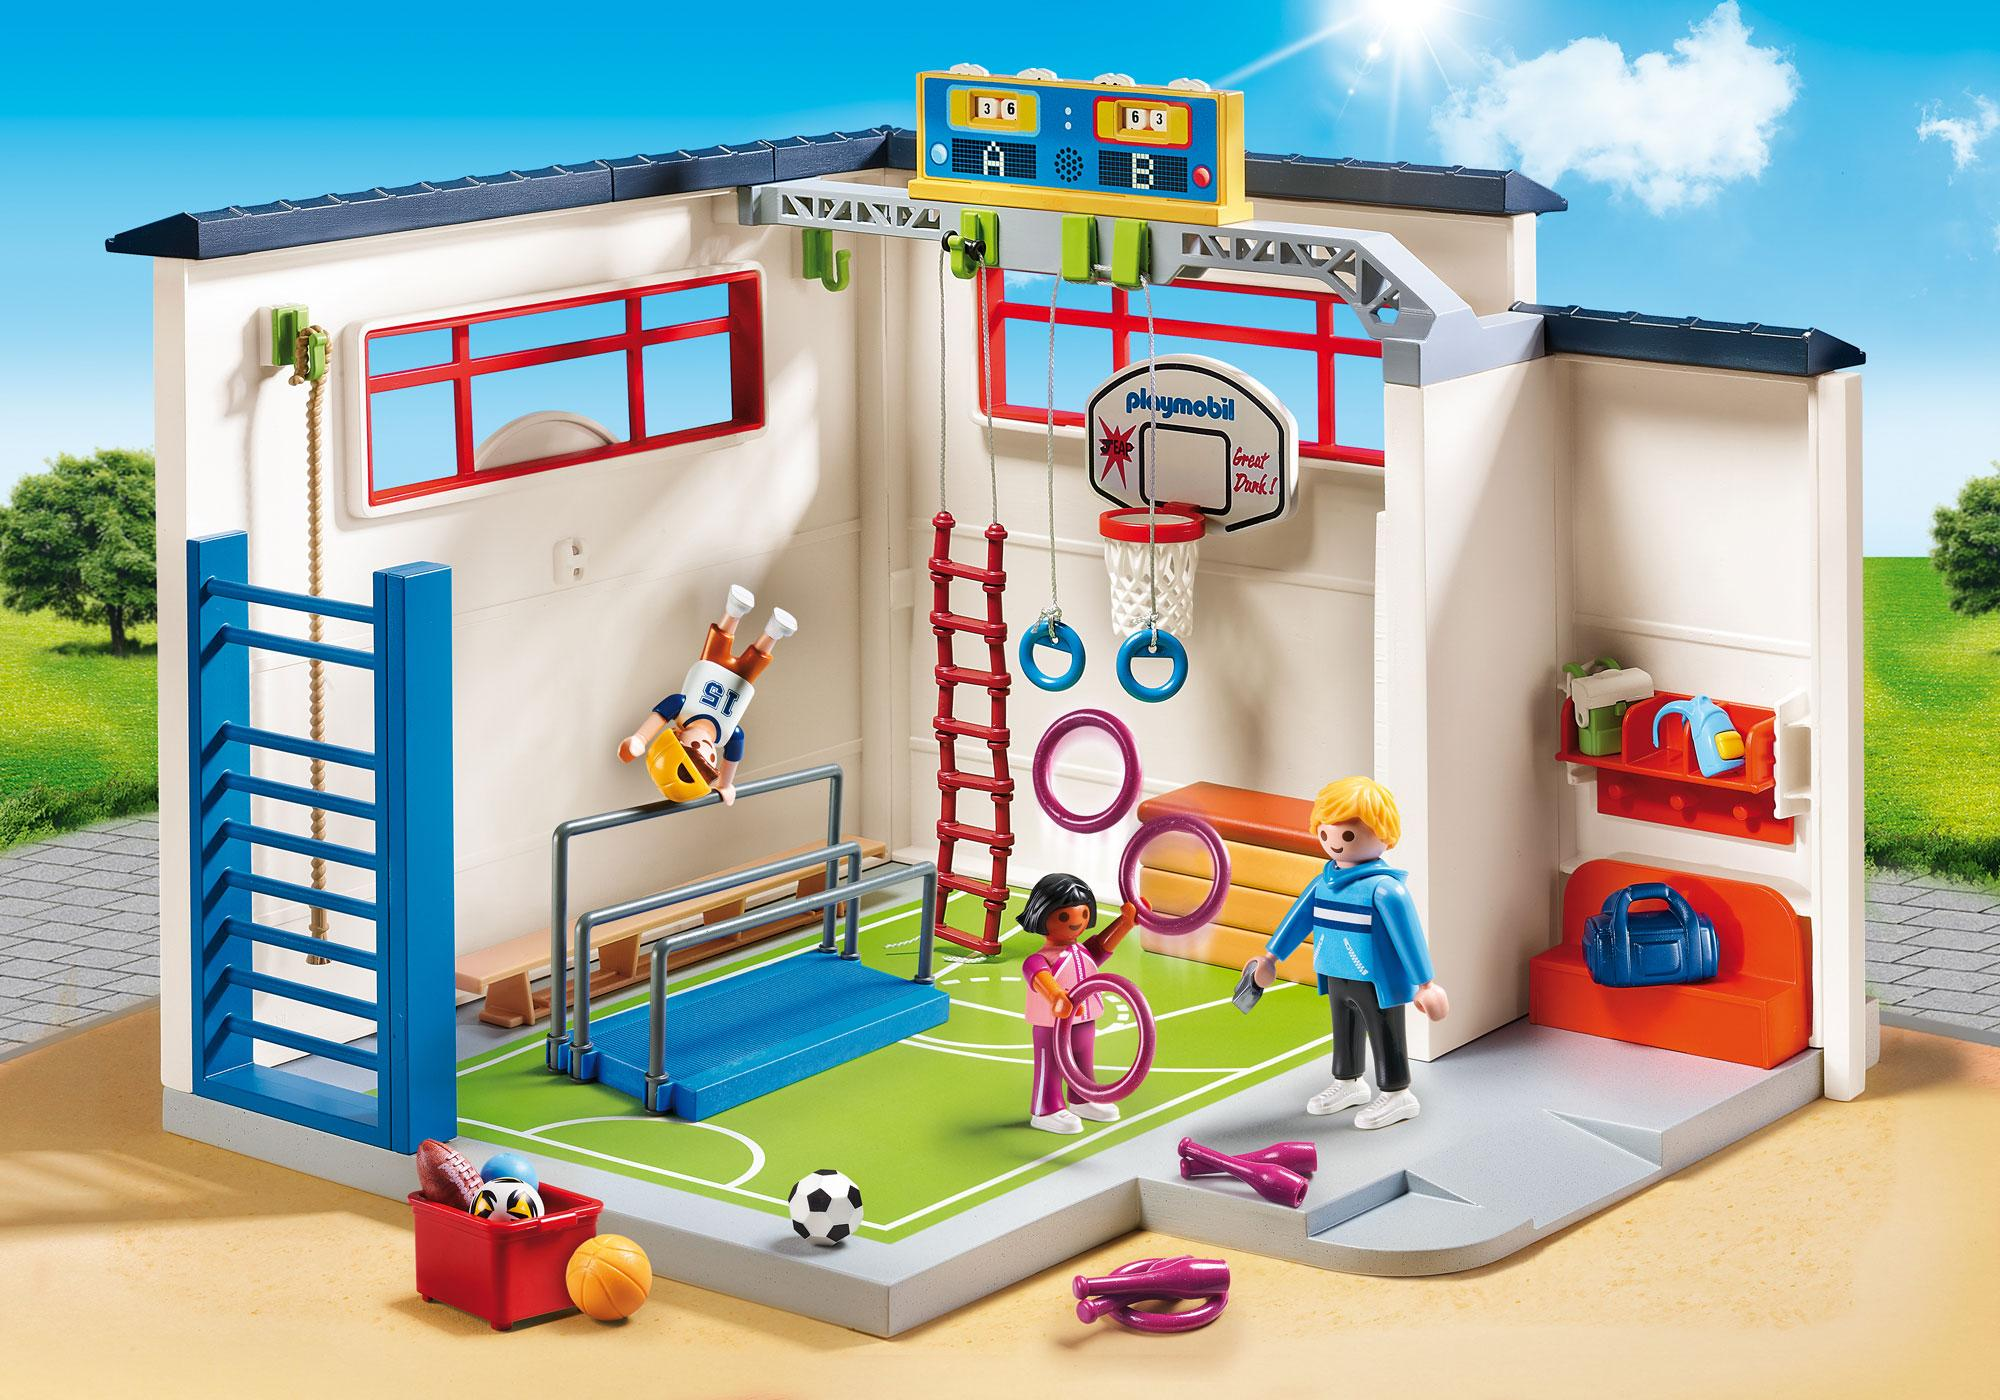 http://media.playmobil.com/i/playmobil/9454_product_detail/Gym